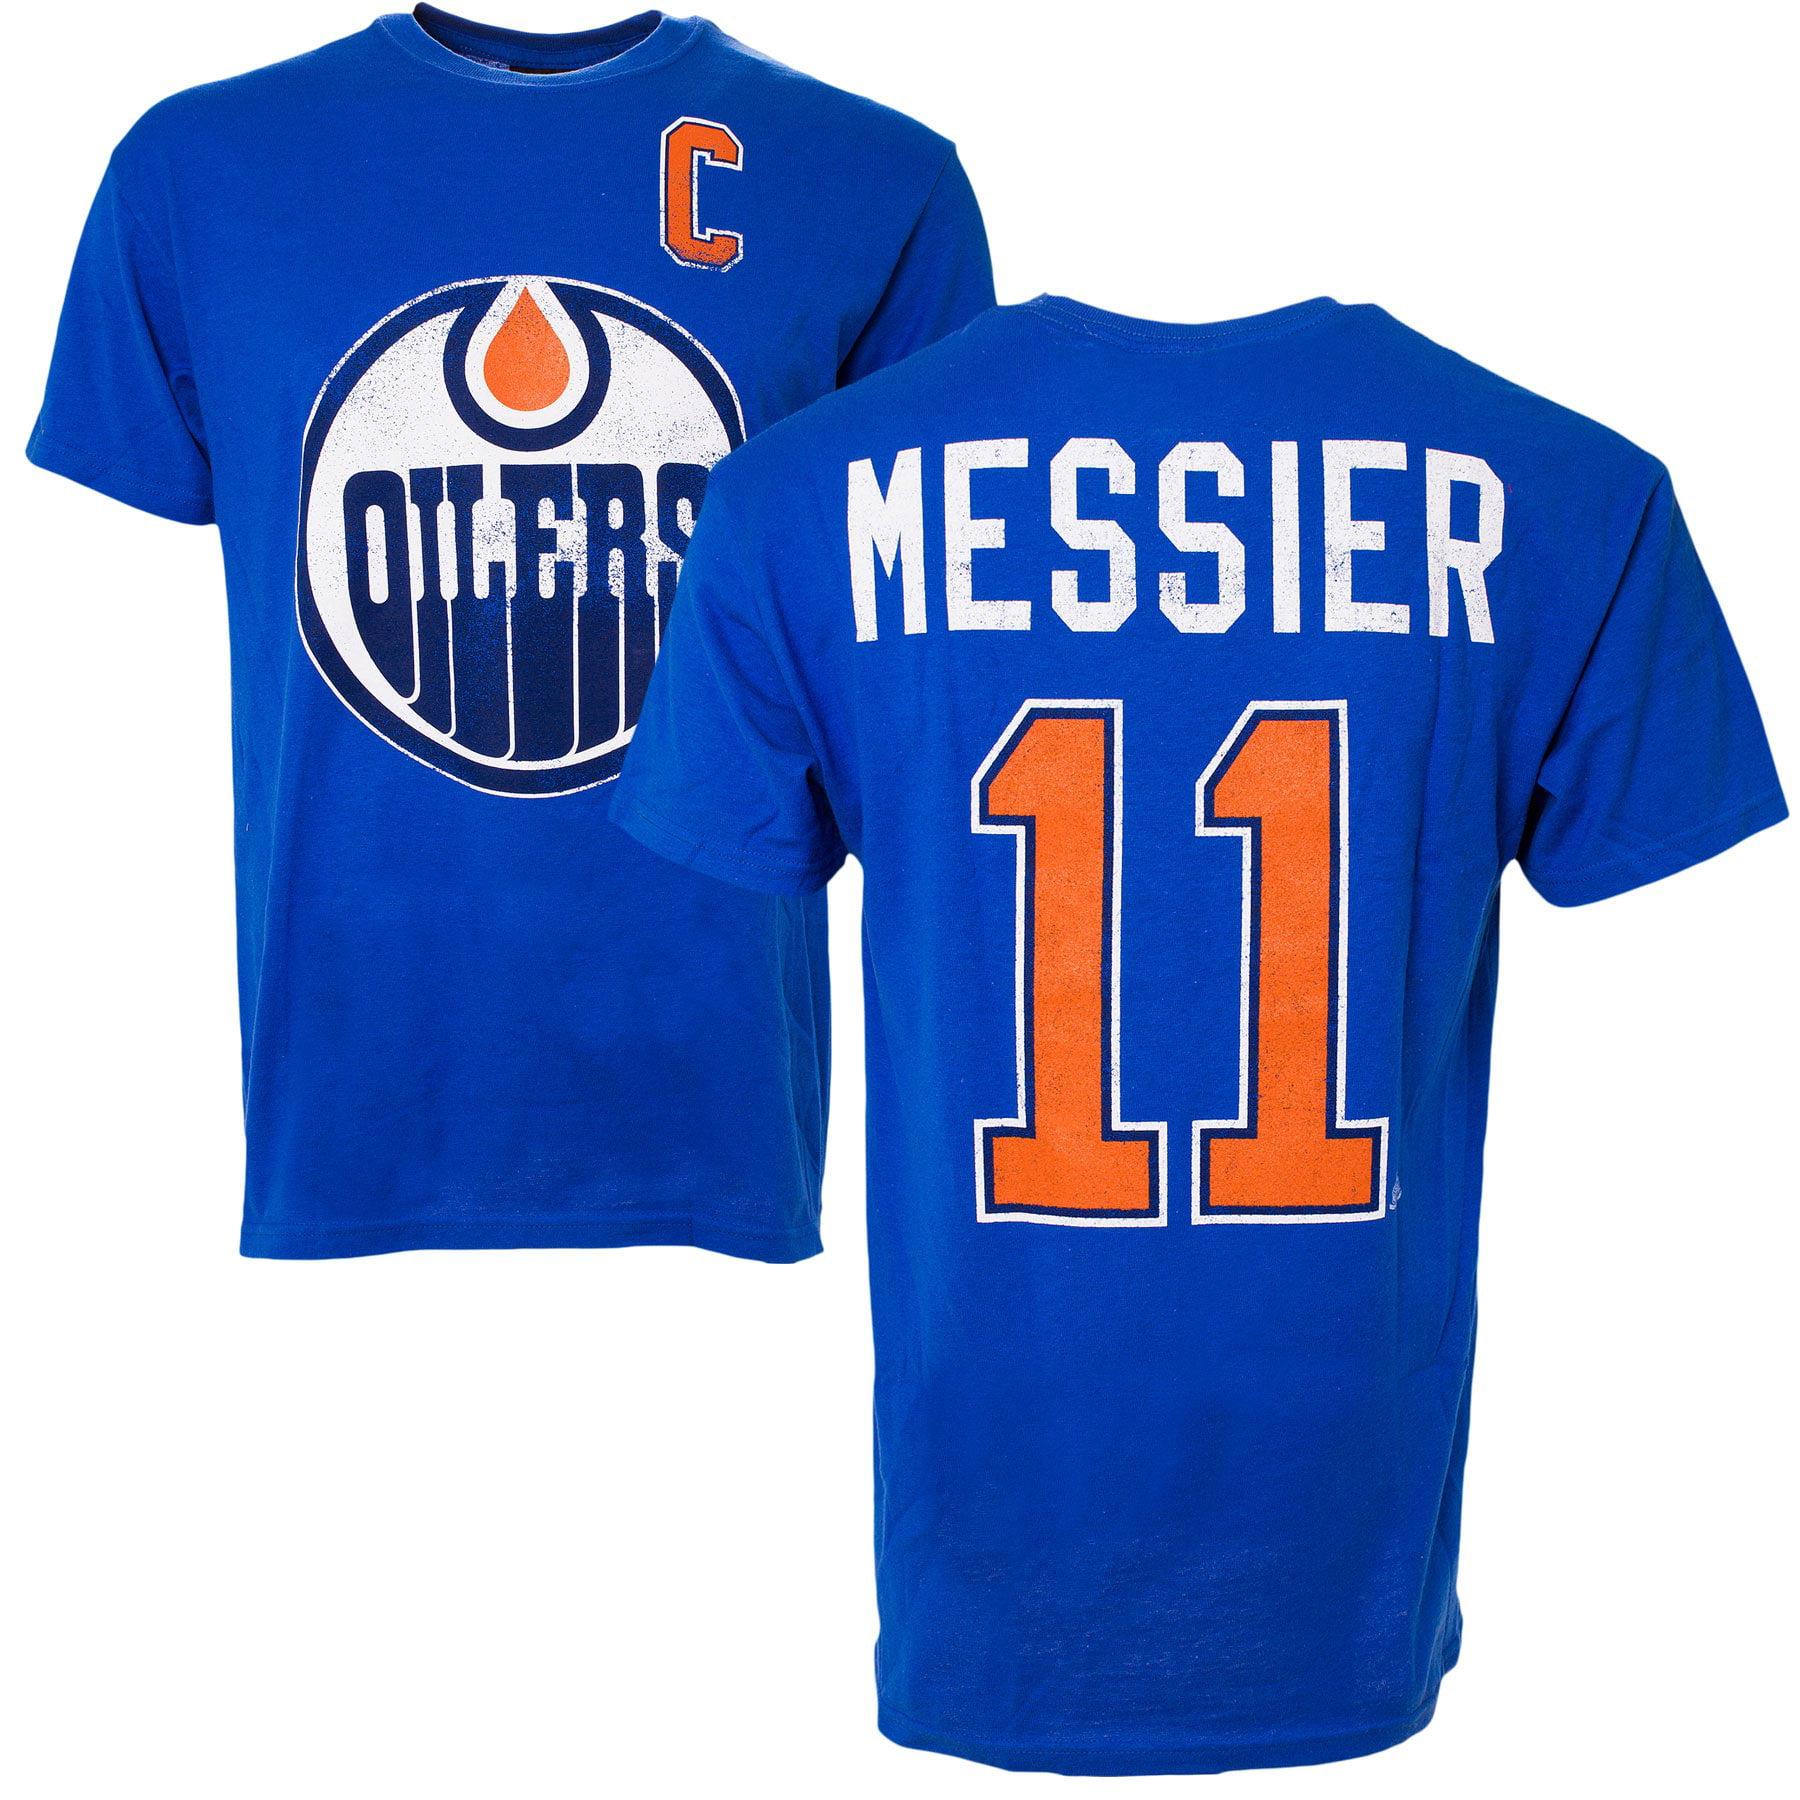 a4339510af7bb Edmonton Oilers Mark Messier Vintage NHL Alumni T-Shirt - Old Time Hockey |  Walmart Canada